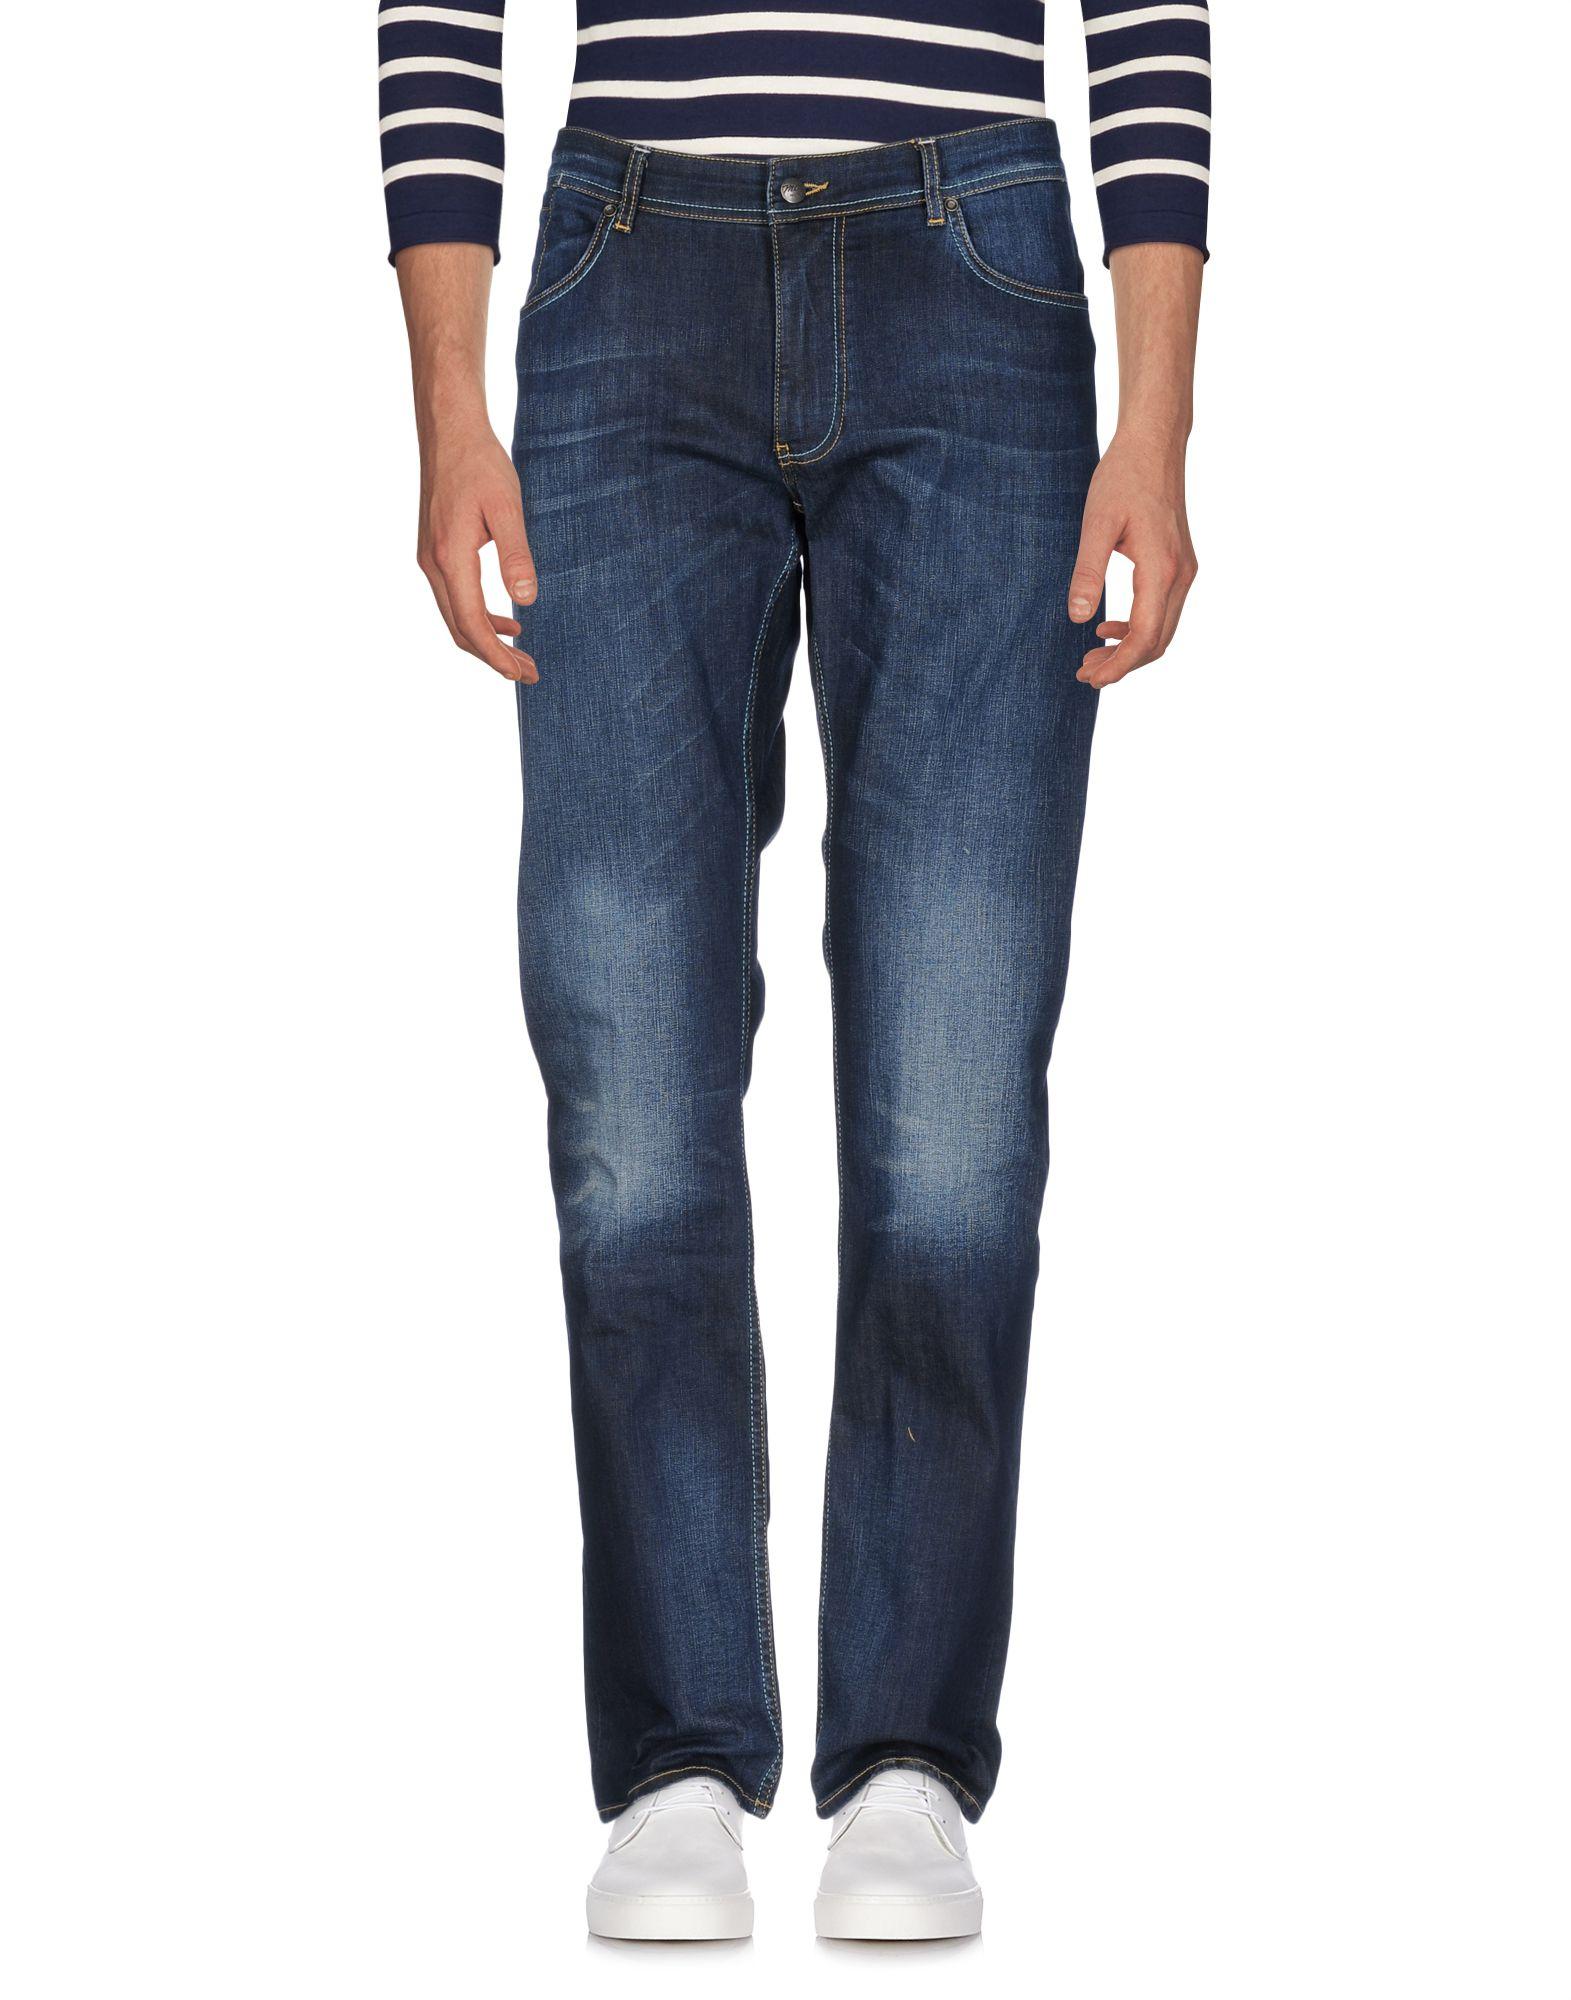 Pantaloni Jeans Mcs Marlboro Classics Uomo - Acquista online su